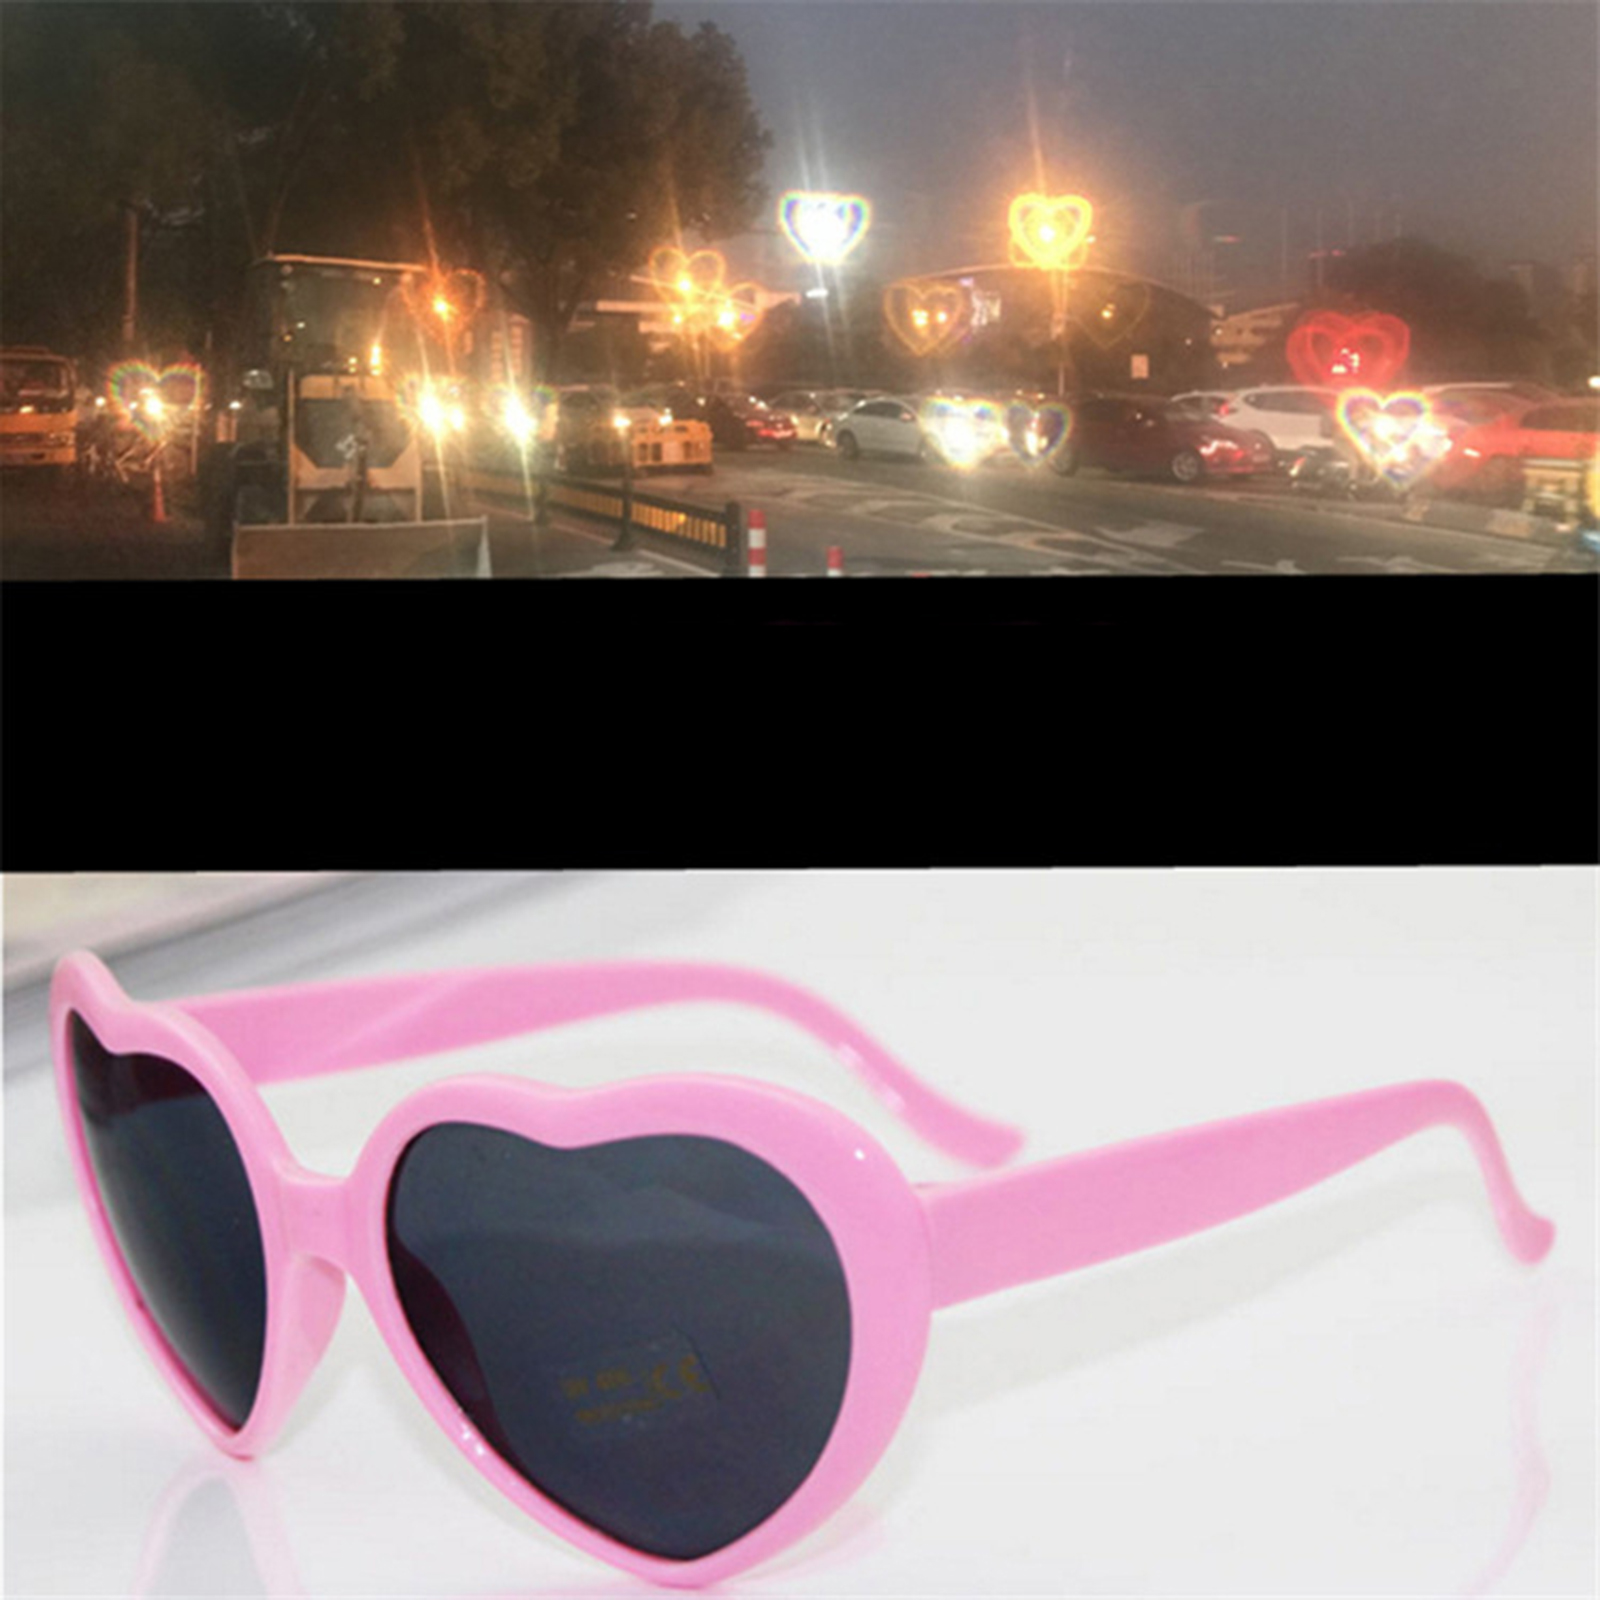 1pc Red Heart Shape Diffraction Grating Party Rave Glasses Plastic, Orbit Light Show Fireworks Refraction Laser Glasses